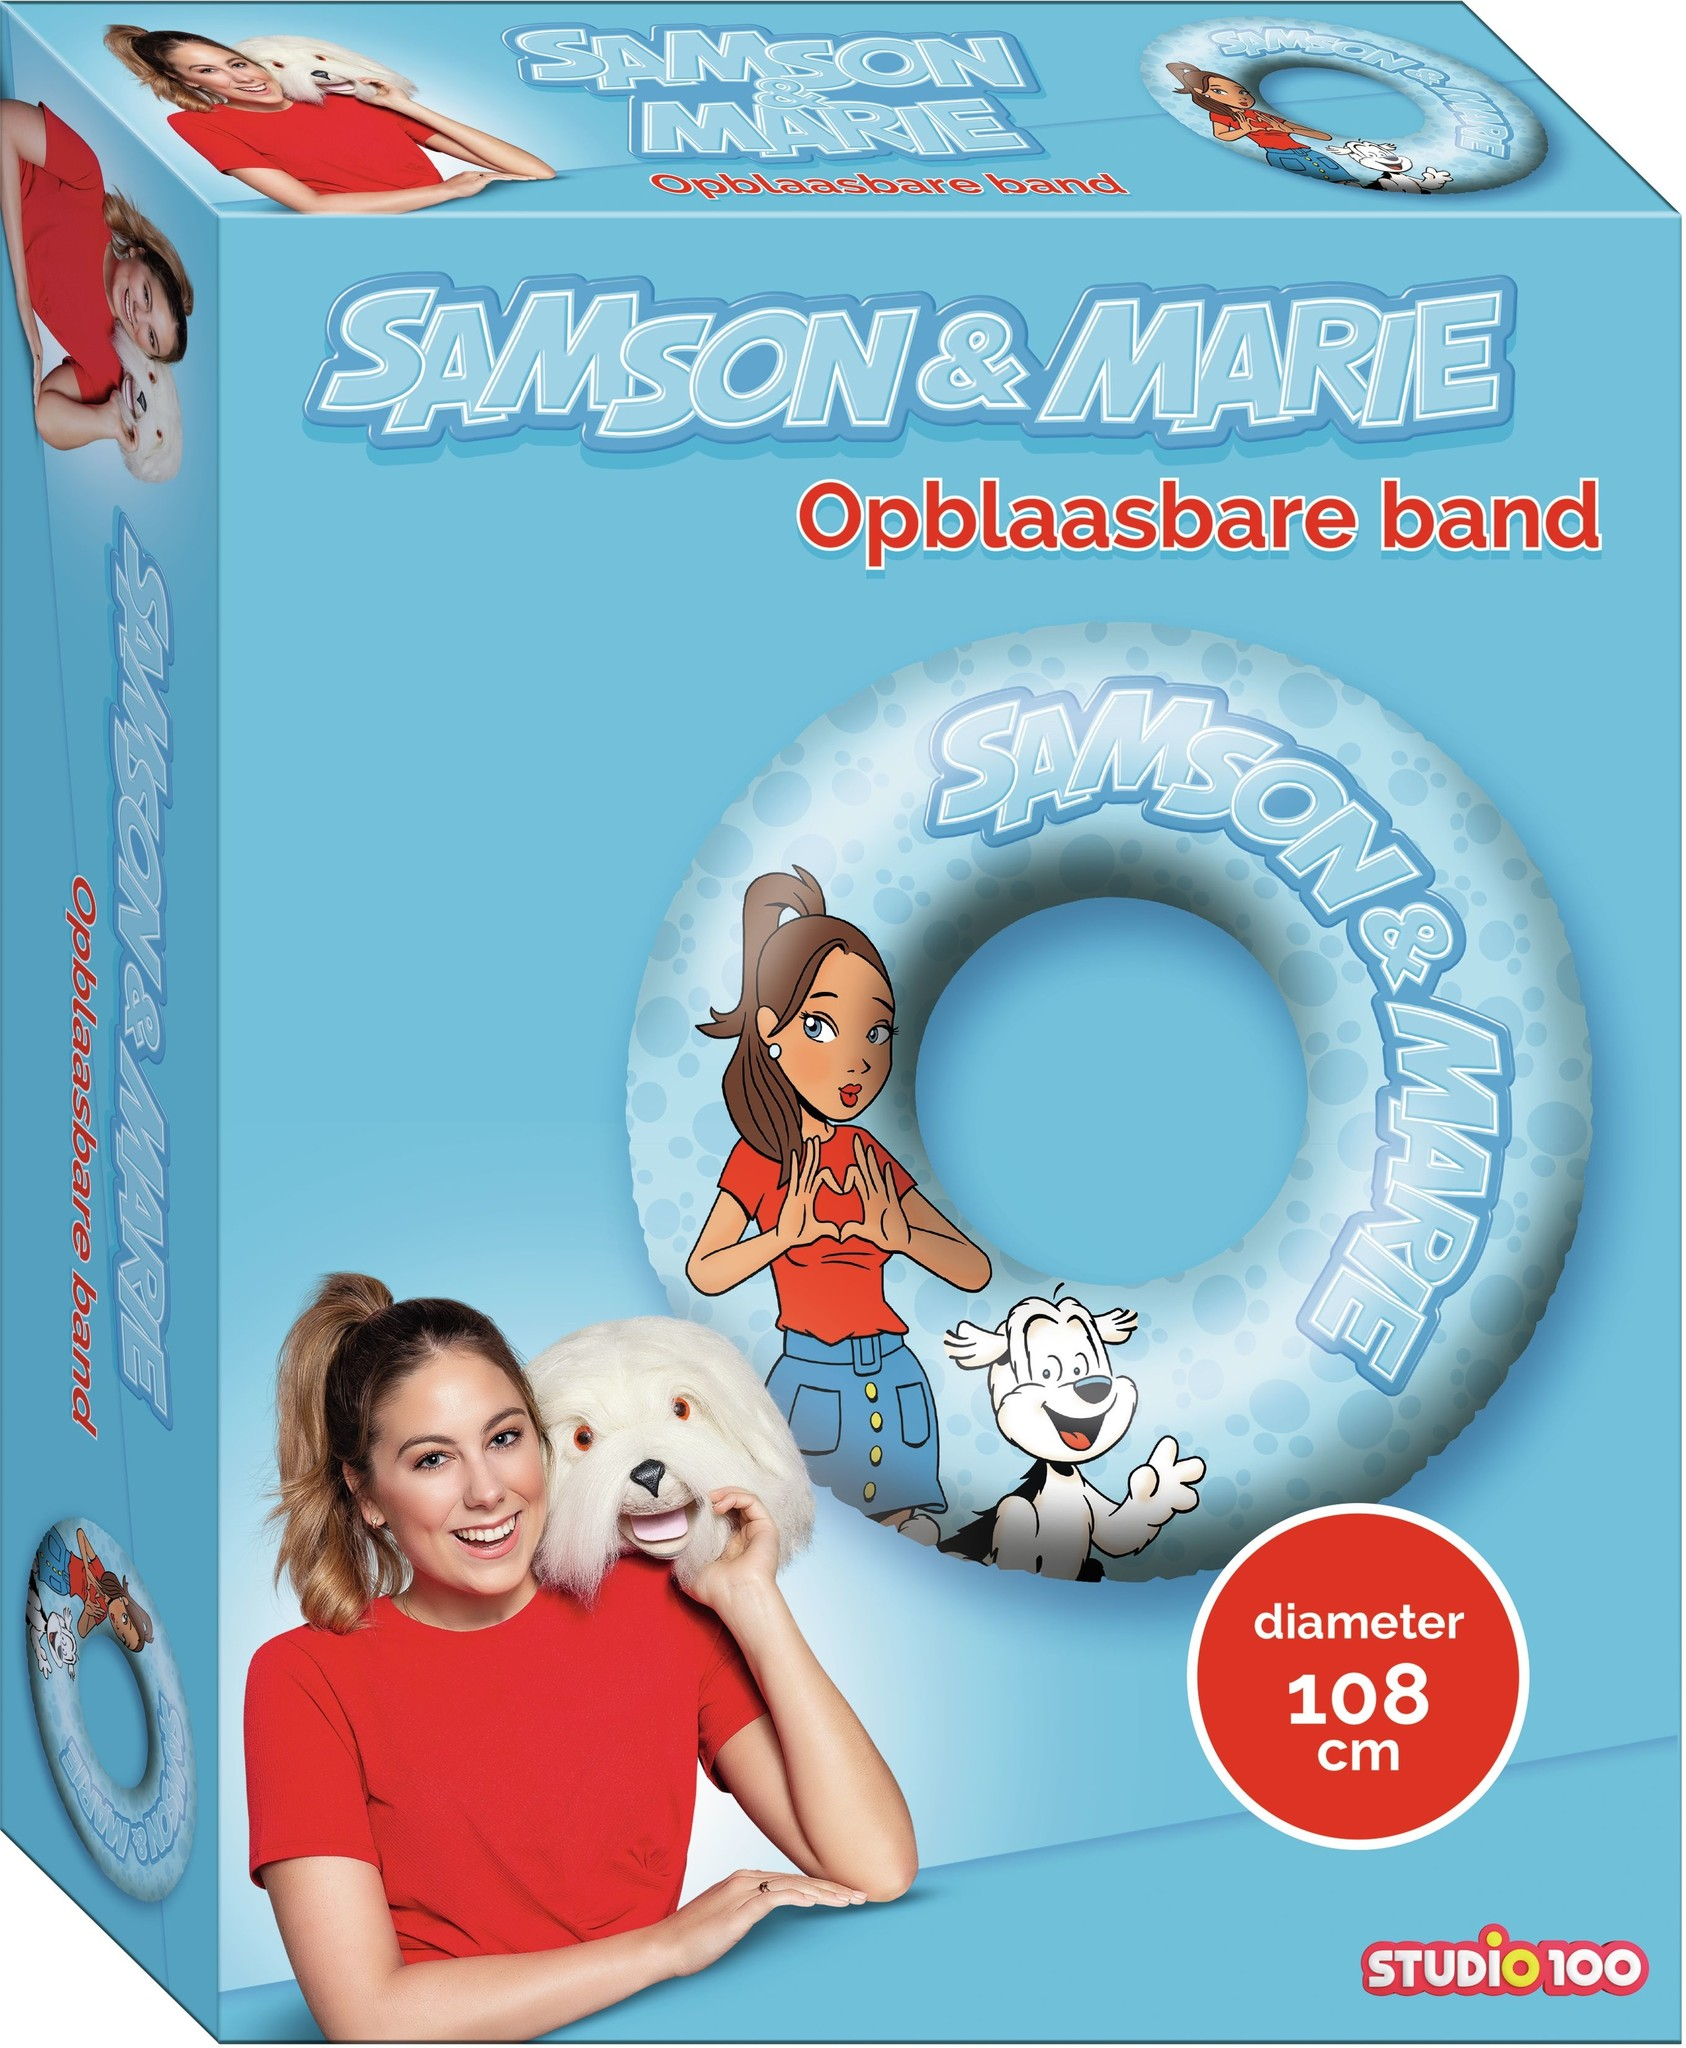 Opblaasbare band Samson en Marie: 108 cm